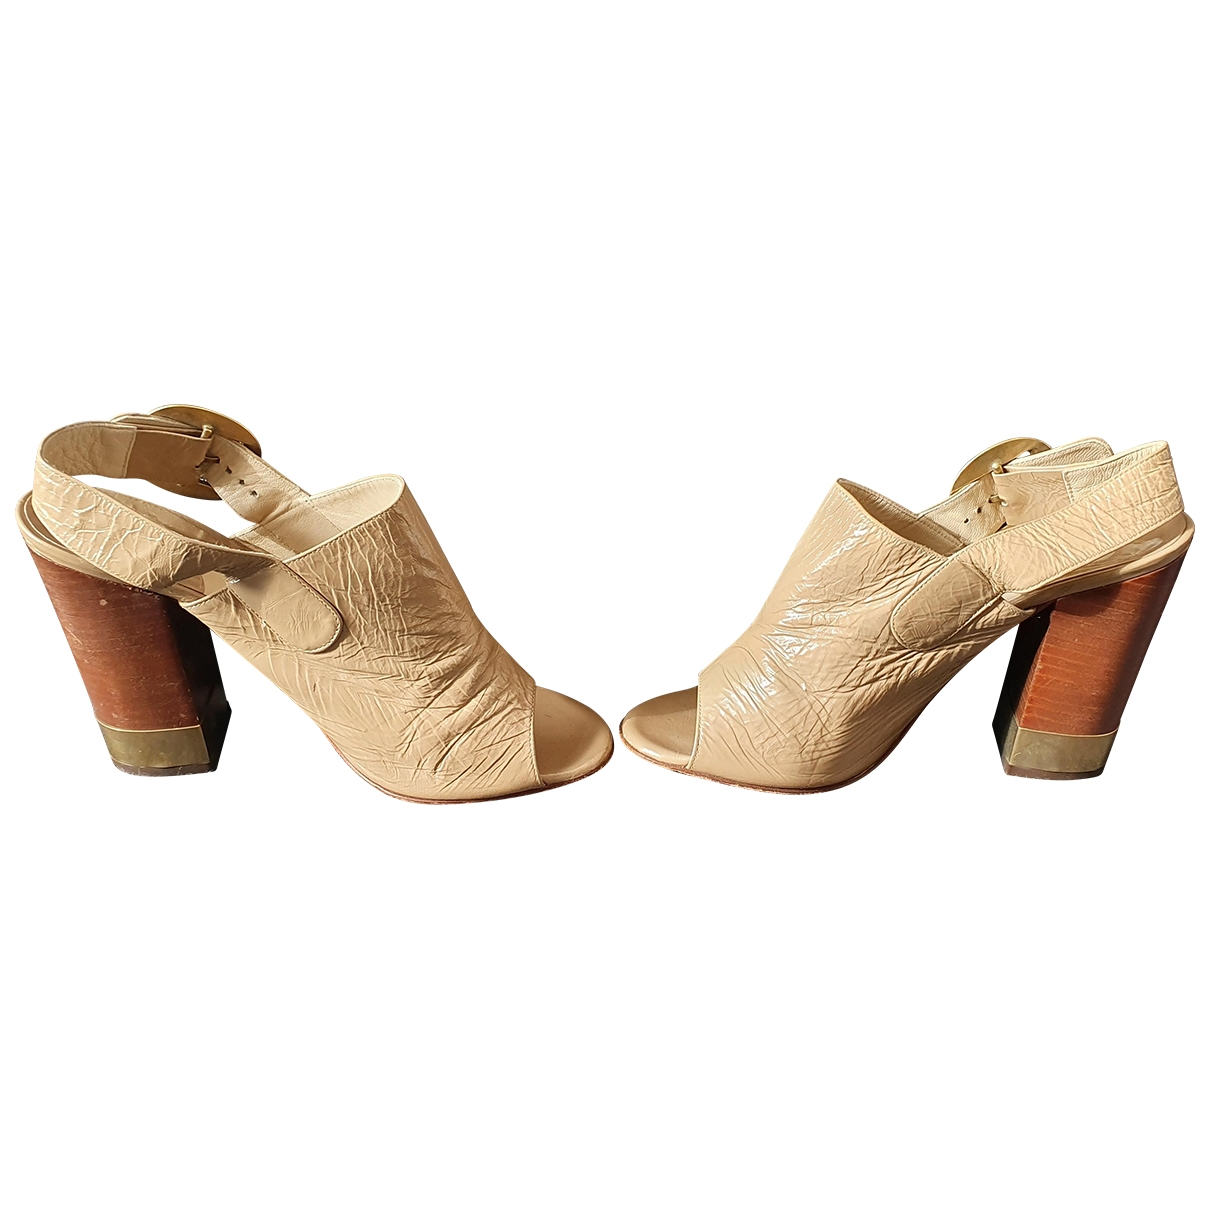 Chloé \N Beige Patent leather Sandals for Women 38 EU